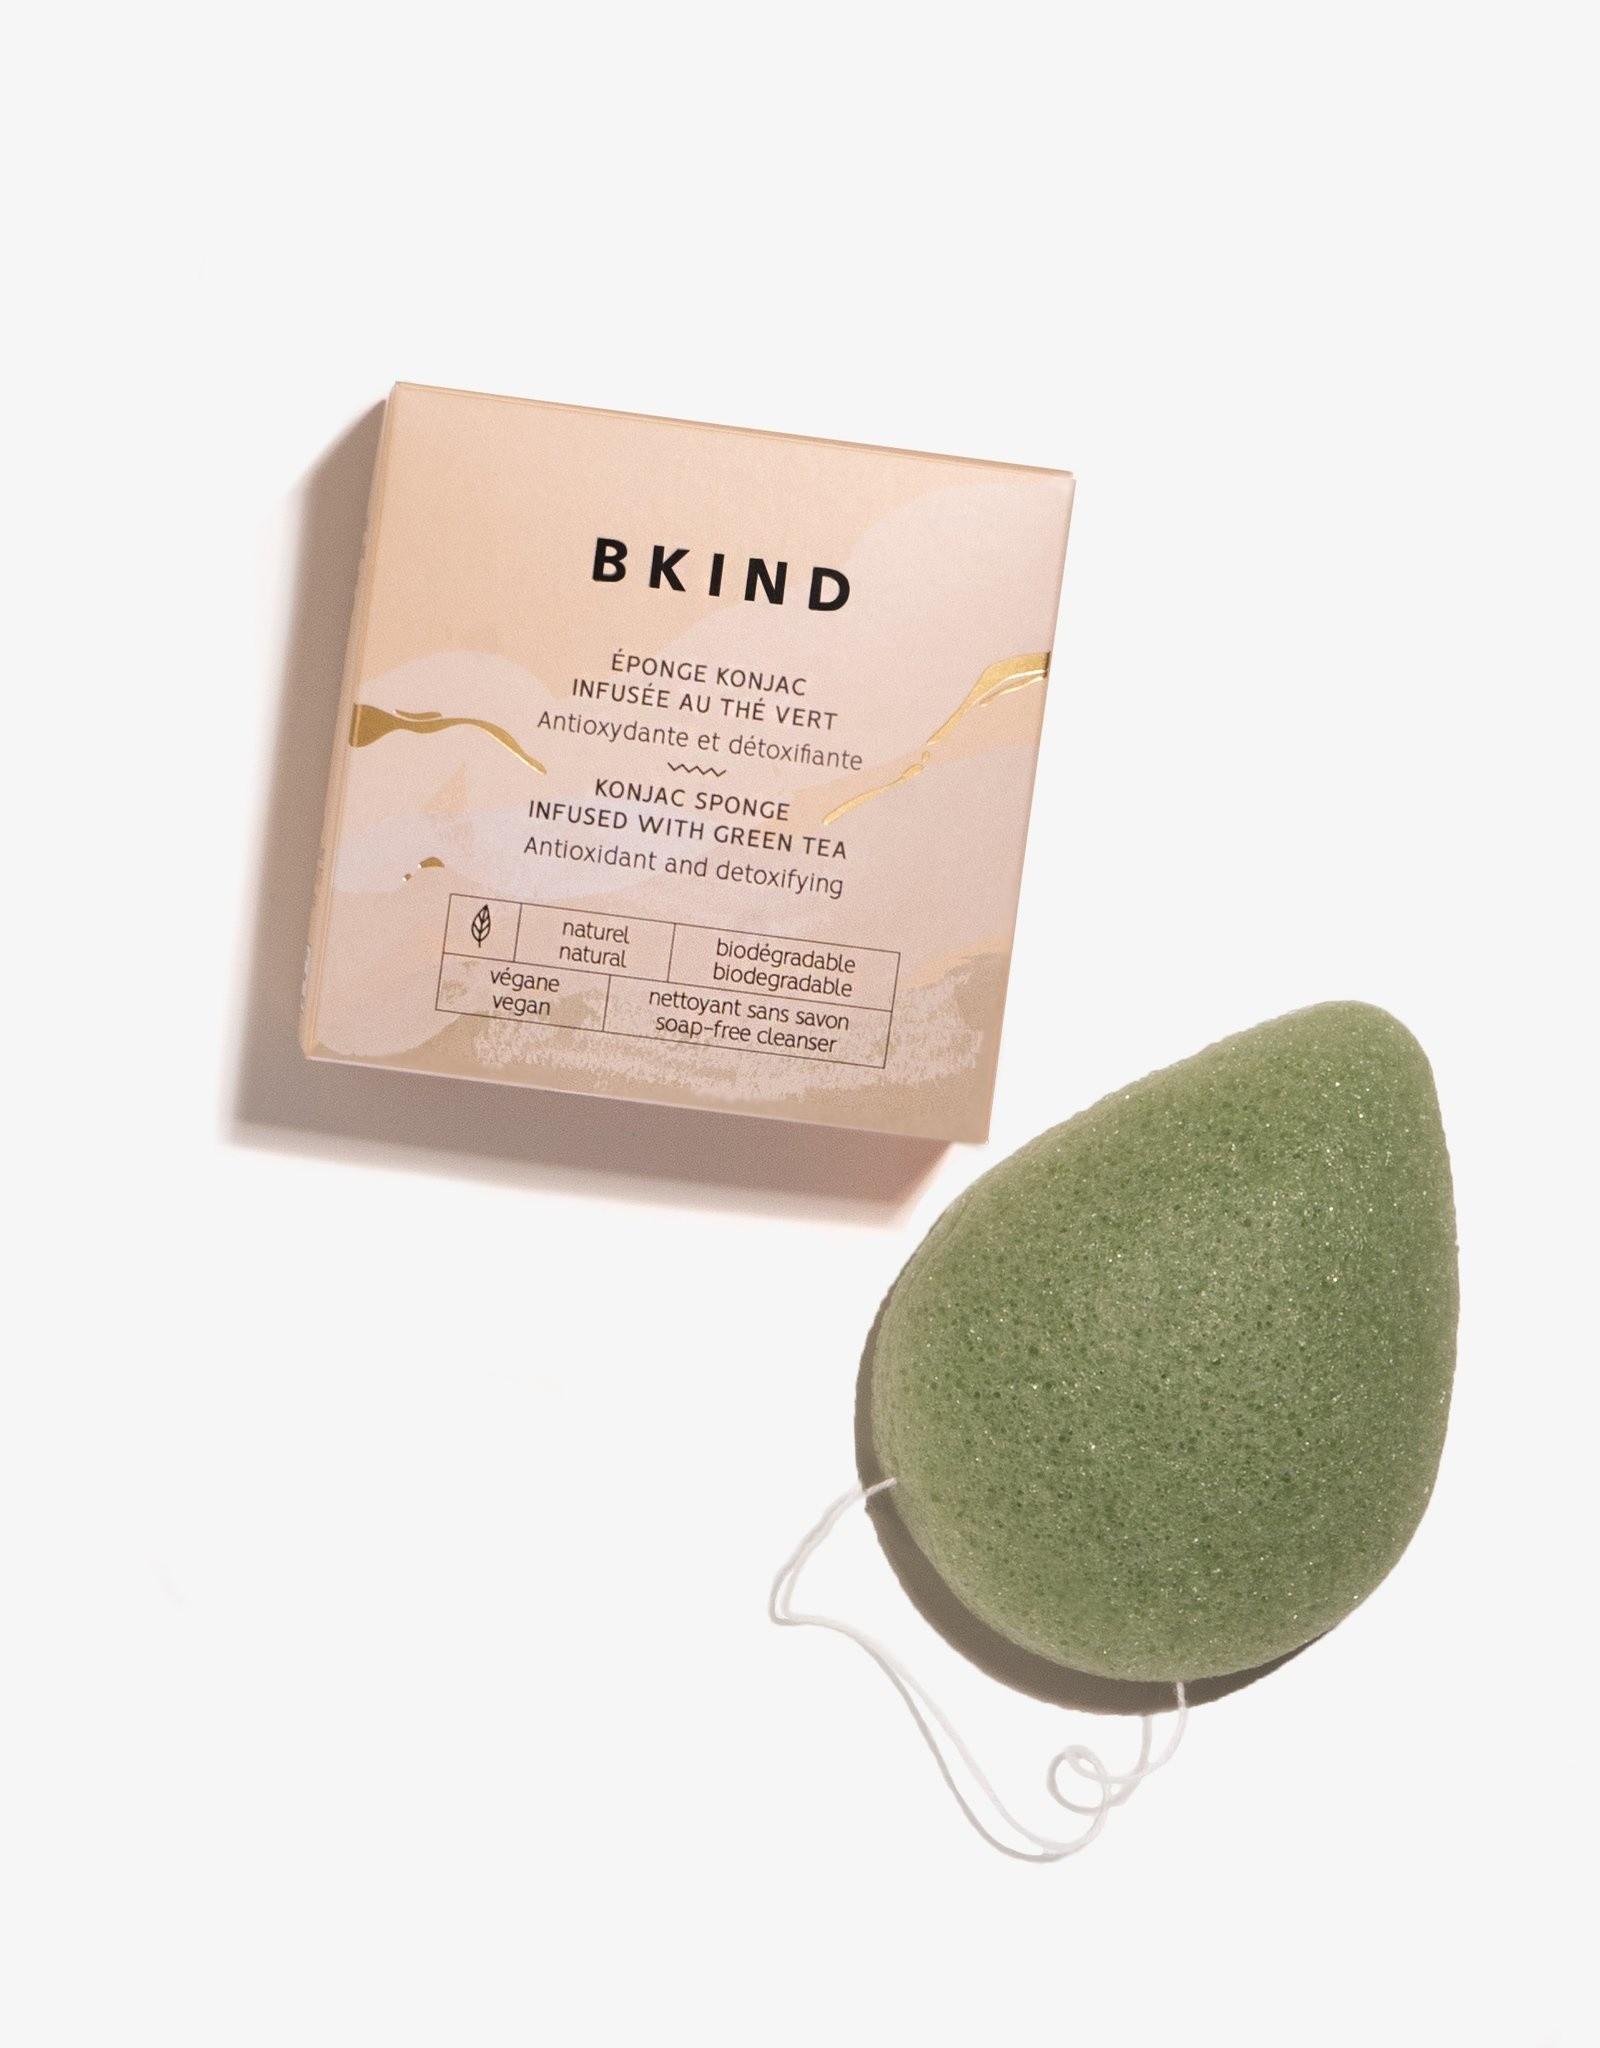 Konjac Facial Sponge infuses with green tea